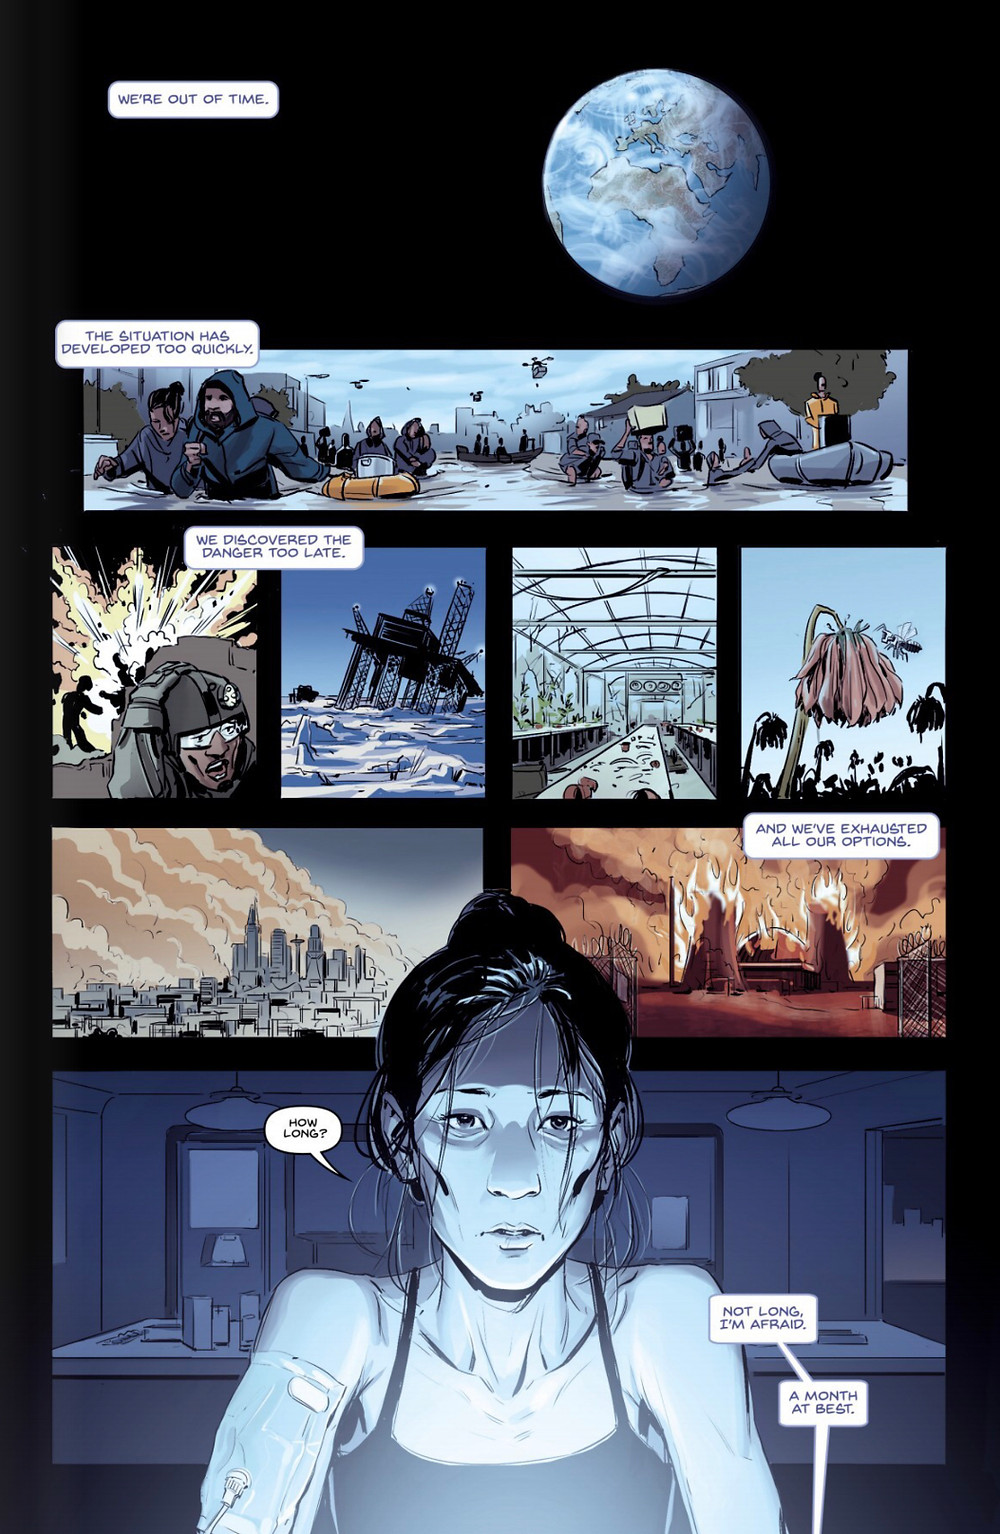 Future, page 3, self-published through Unbound Publishing, Woodman/Smissen